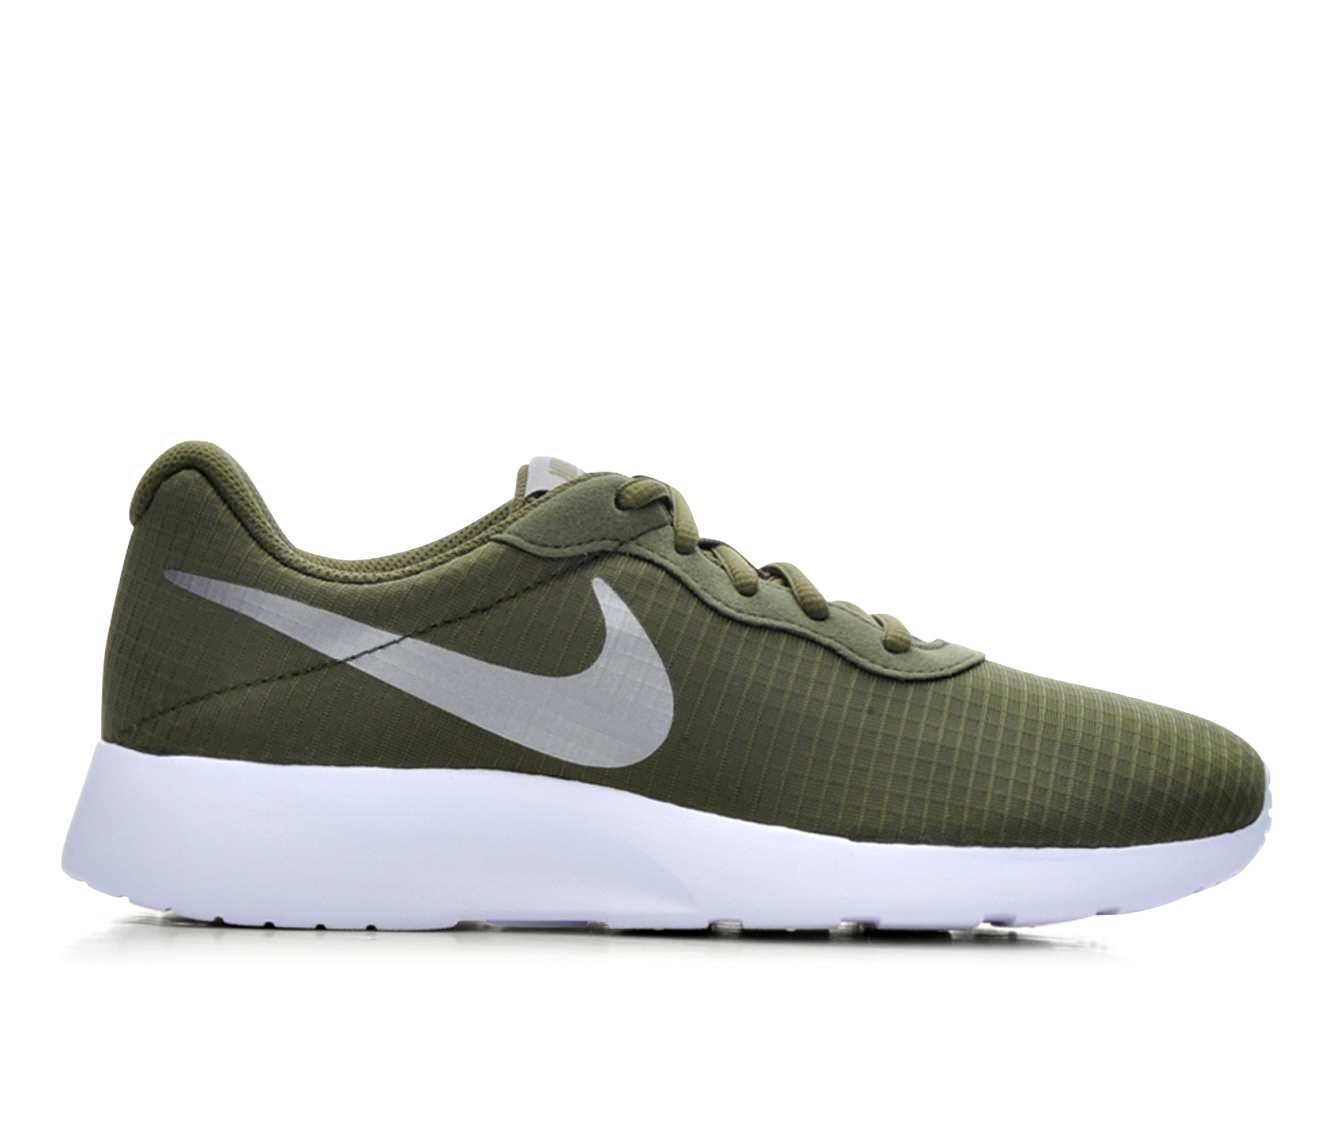 Women's Nike Tanjun SE Sneakers (Green - Size 9.5) 1615348